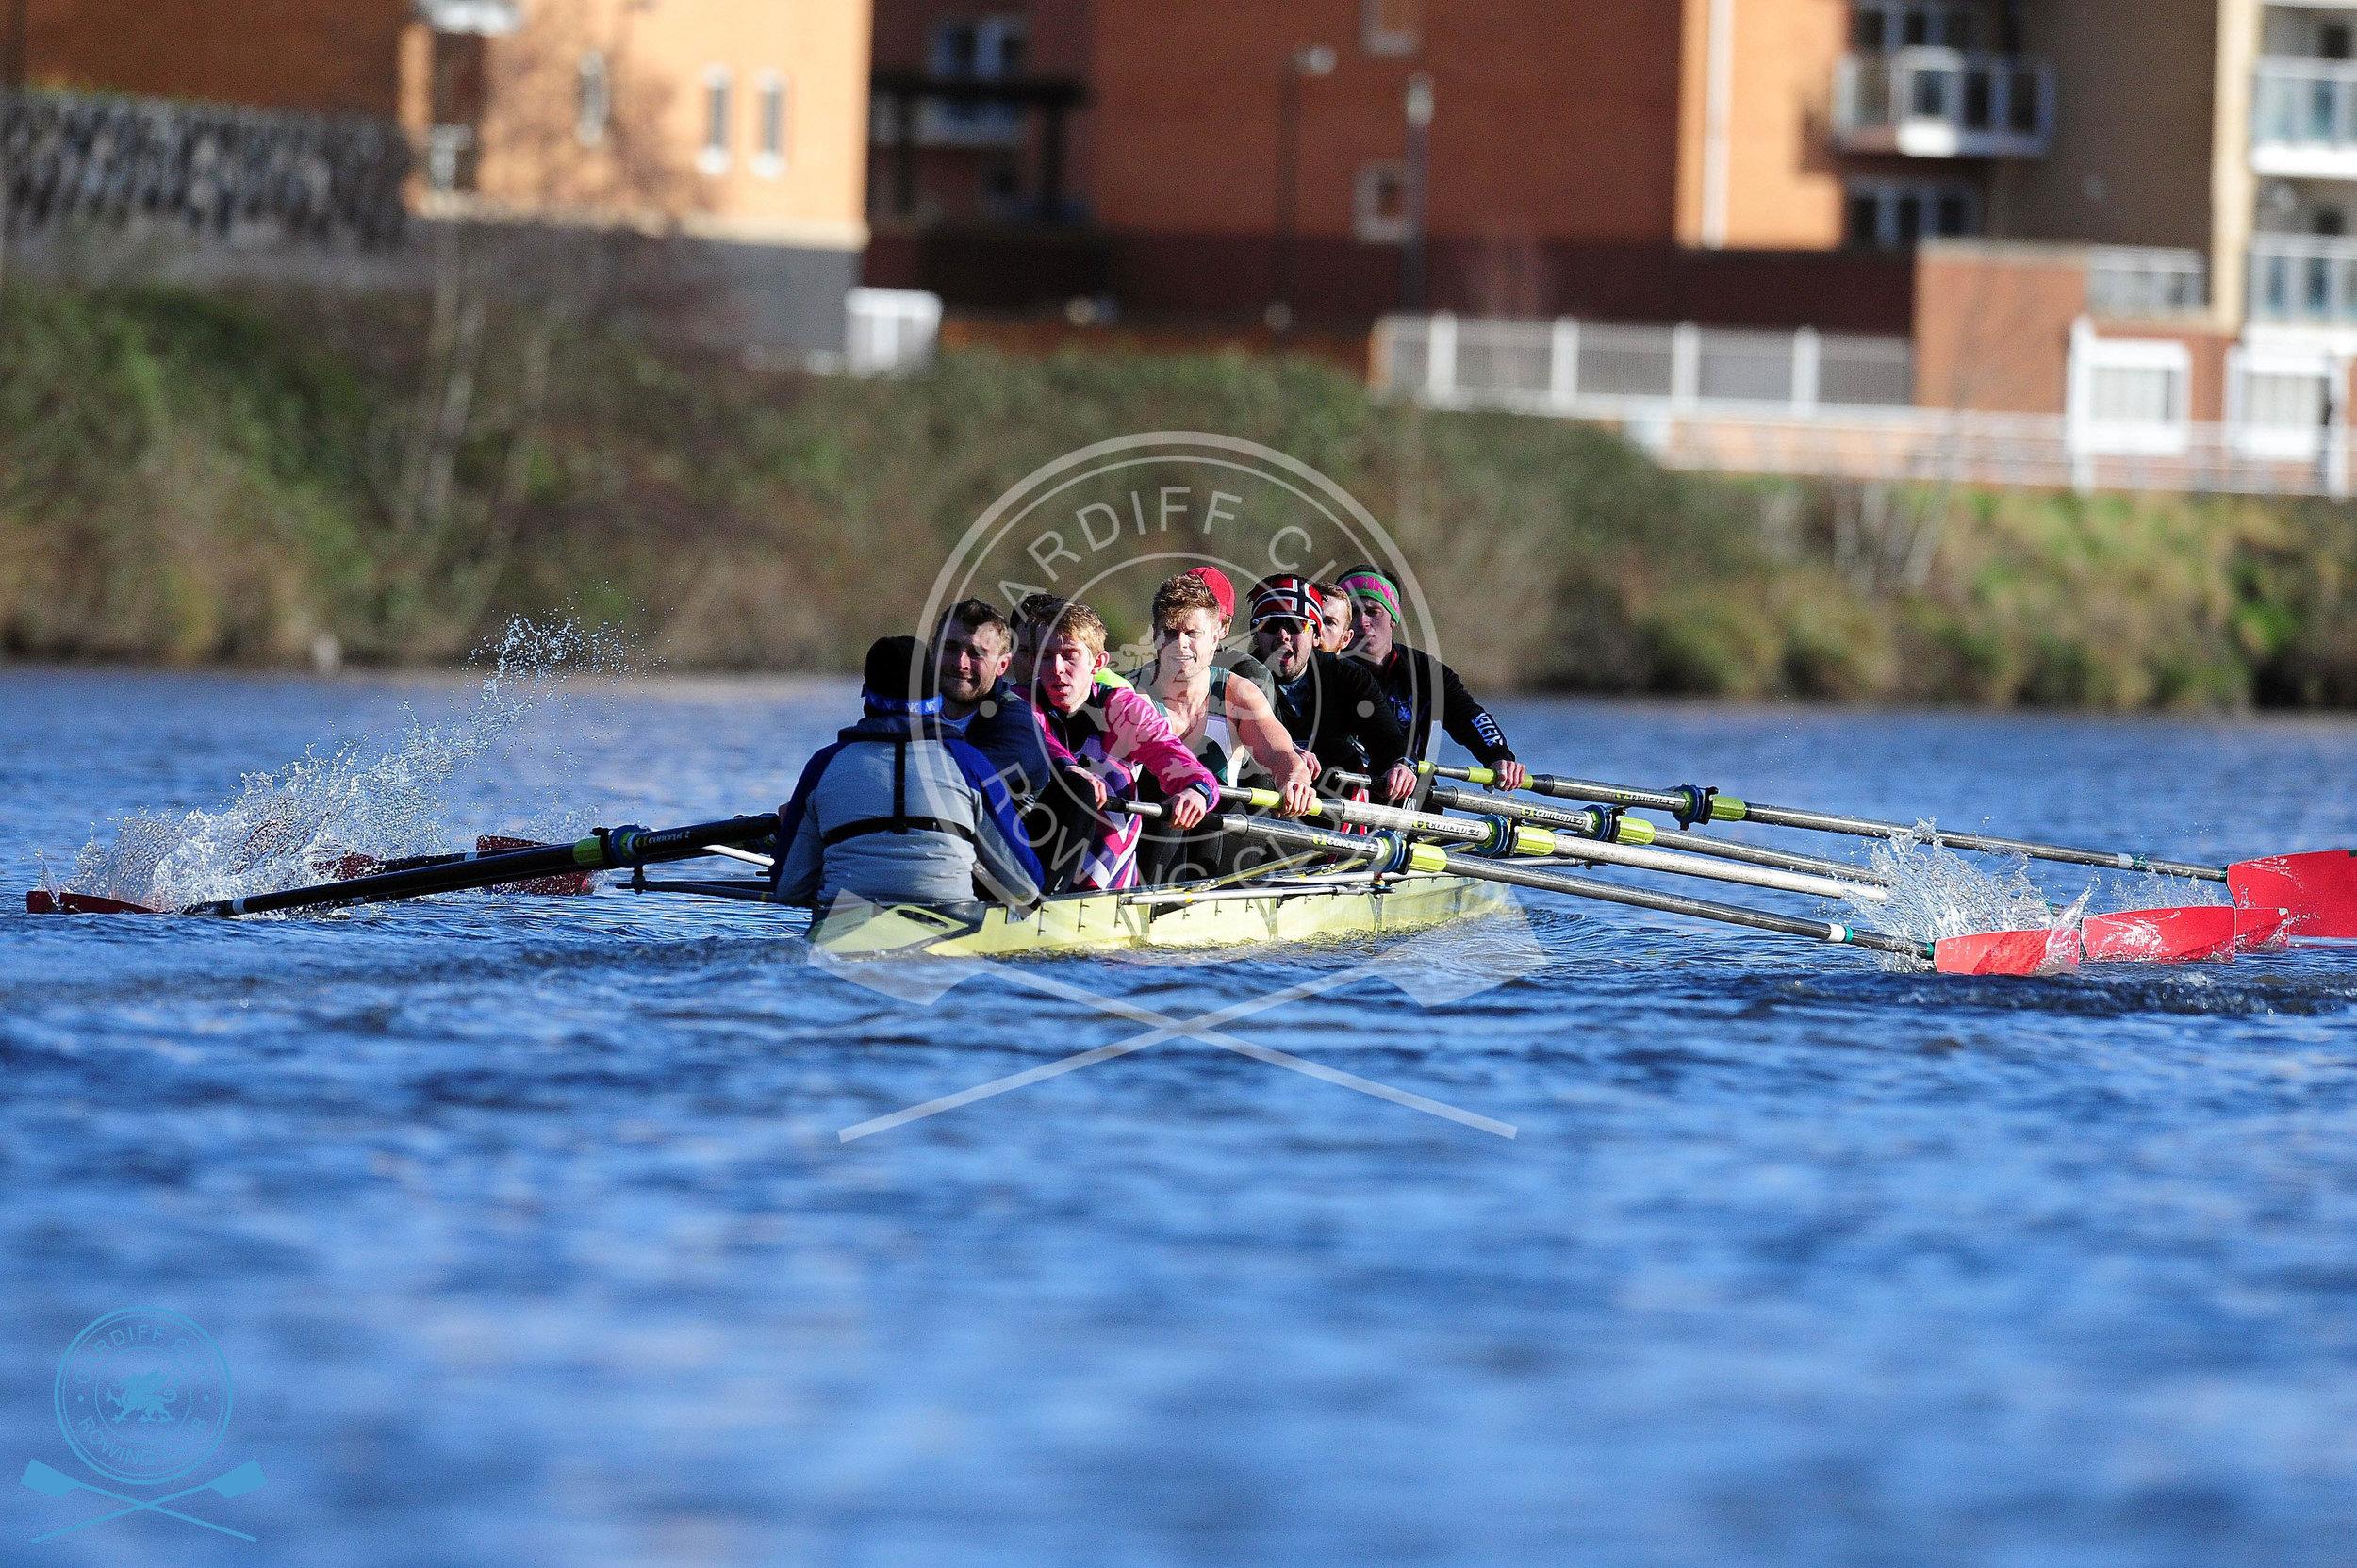 DW_280119_Cardiff_City_Rowing_225.jpg